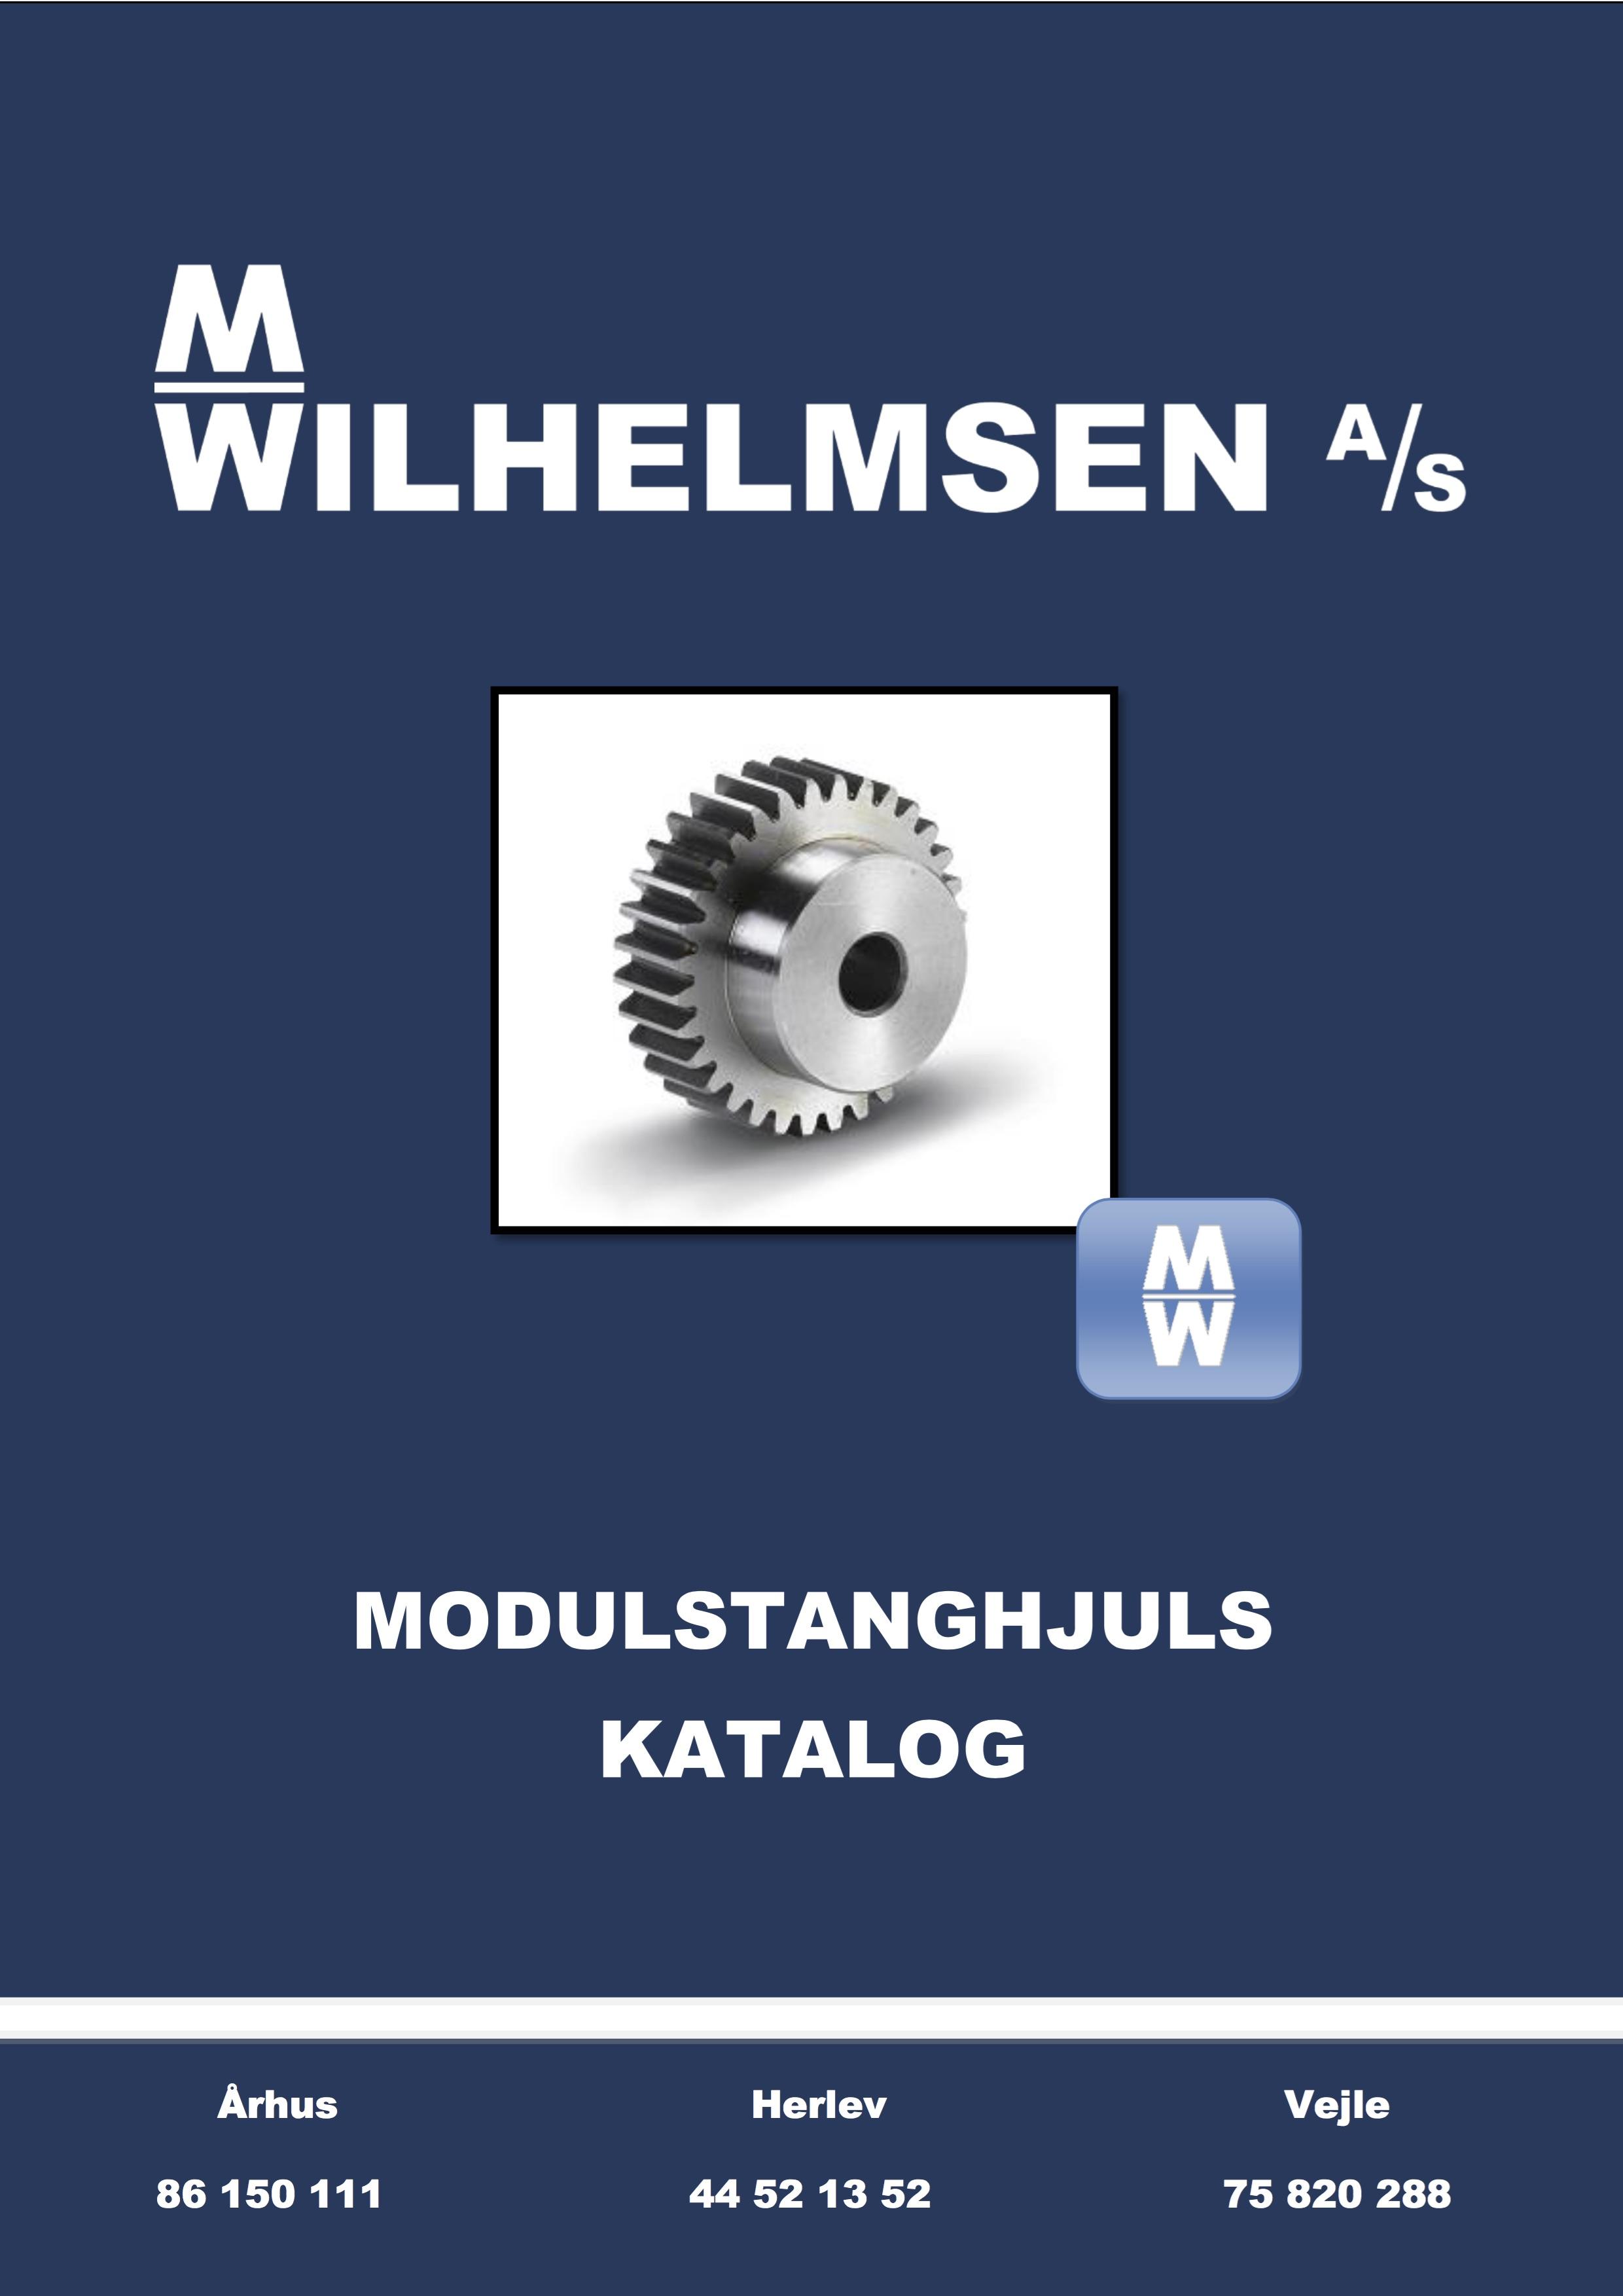 Modulstanghjul katalog